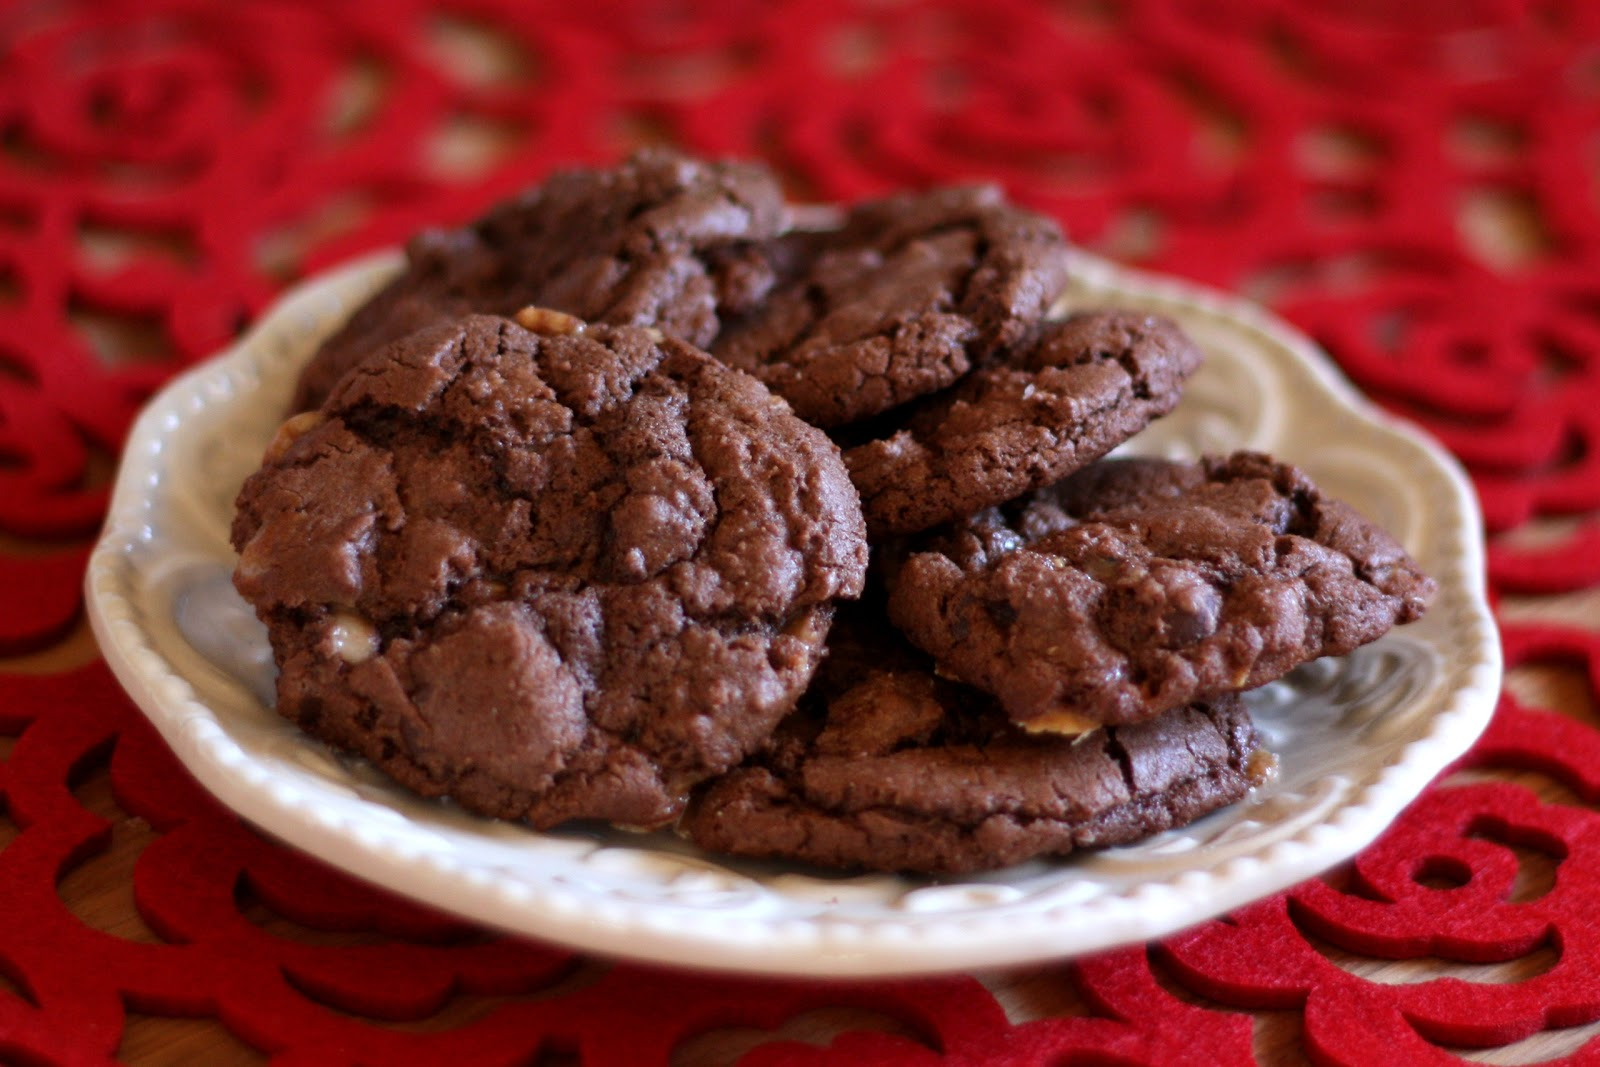 Dark Chocolate Toffee Cookies - Gluten Free or Not